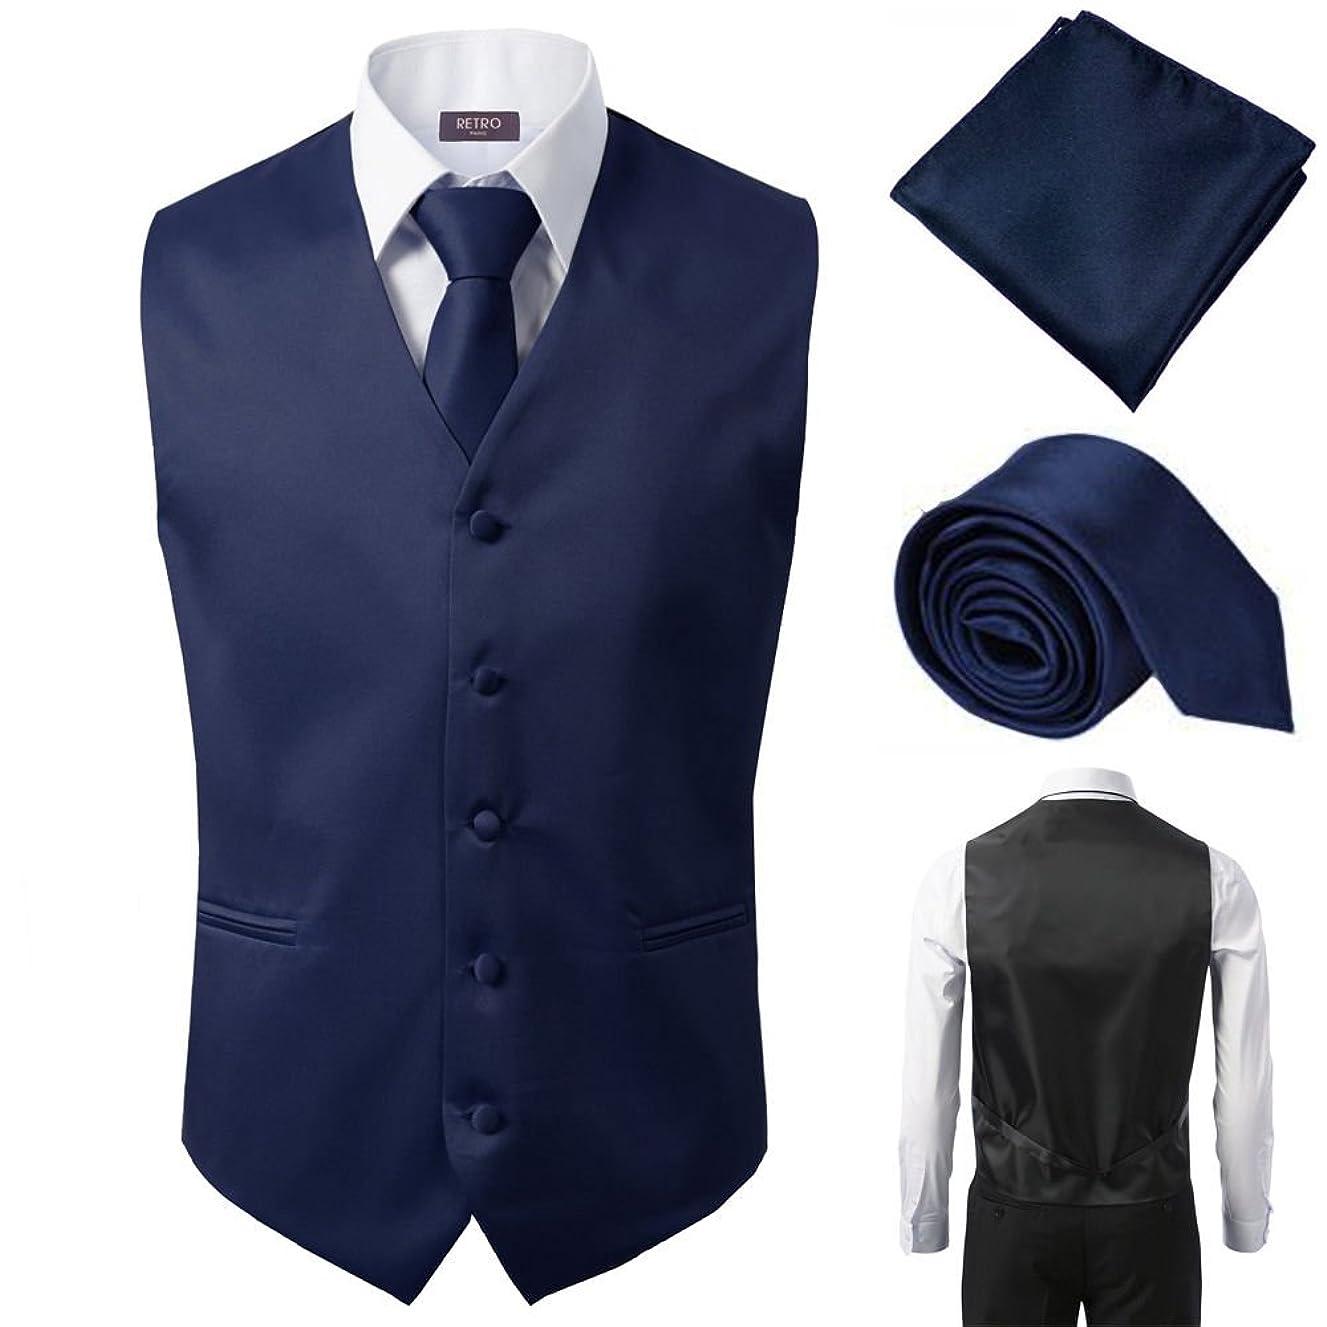 3 Pcs Vest + Tie + Hankie Fashion Men's Formal Dress Suit Slim Tuxedo Waistcoat Coat Navy